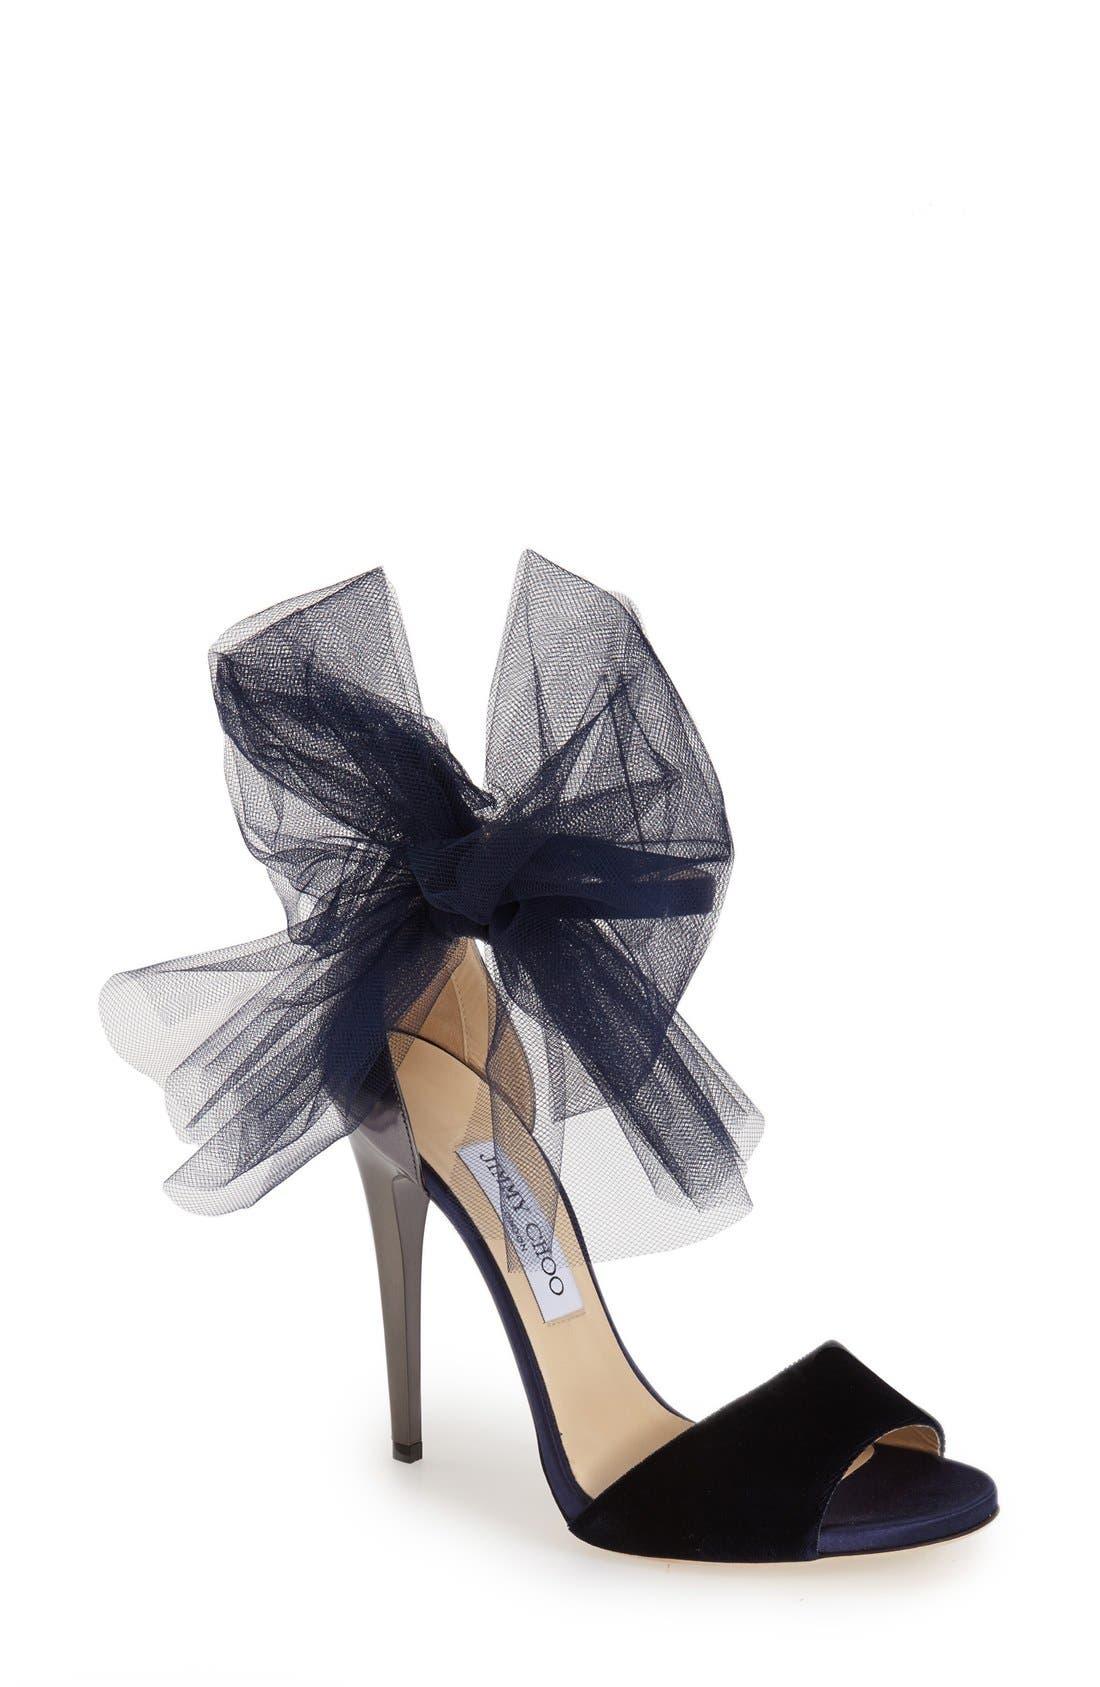 Main Image - Jimmy Choo 'Lilyth' Sandal (Women)